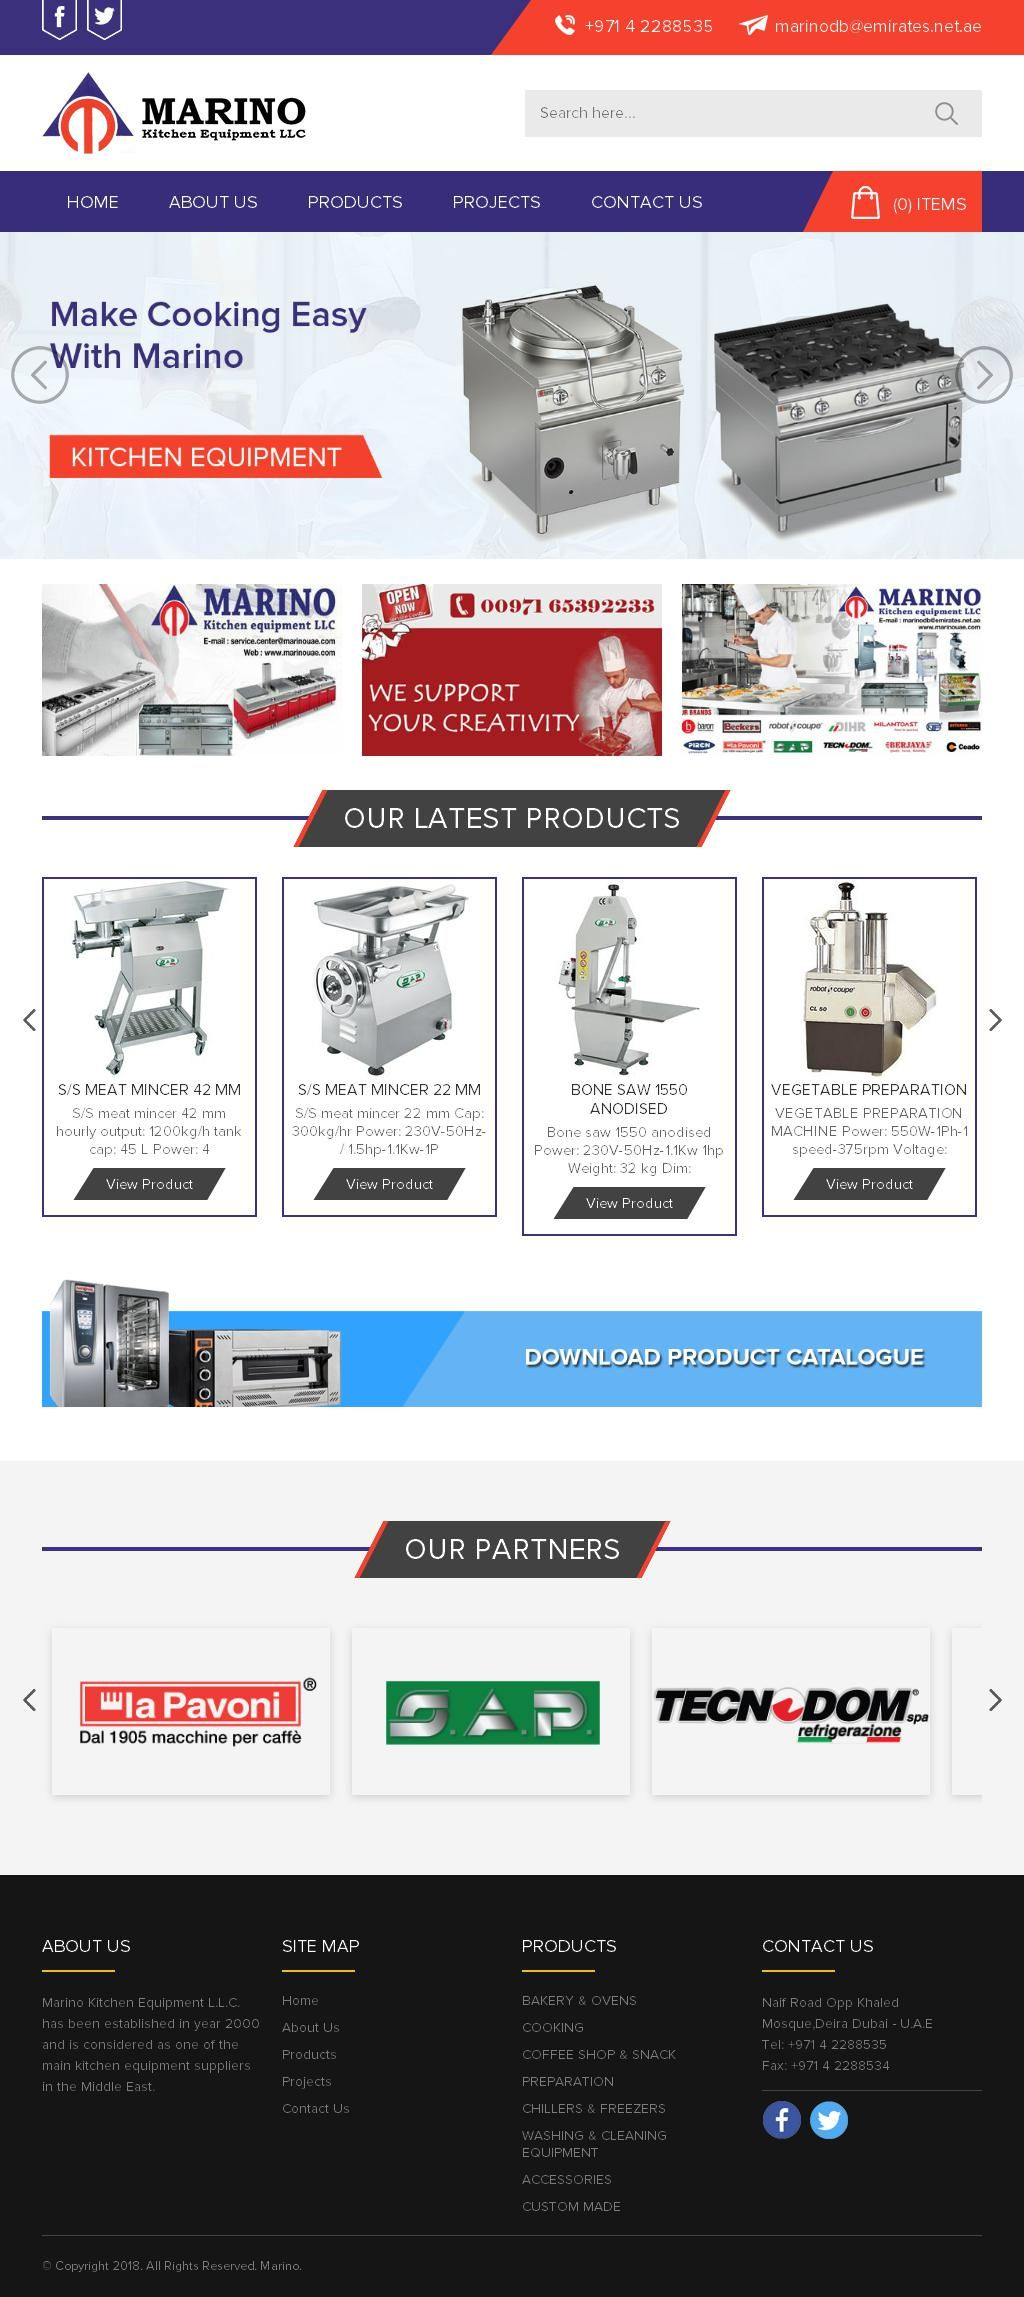 Marino Kitchen Equipment, Llc ETA Star House, 173, Salah